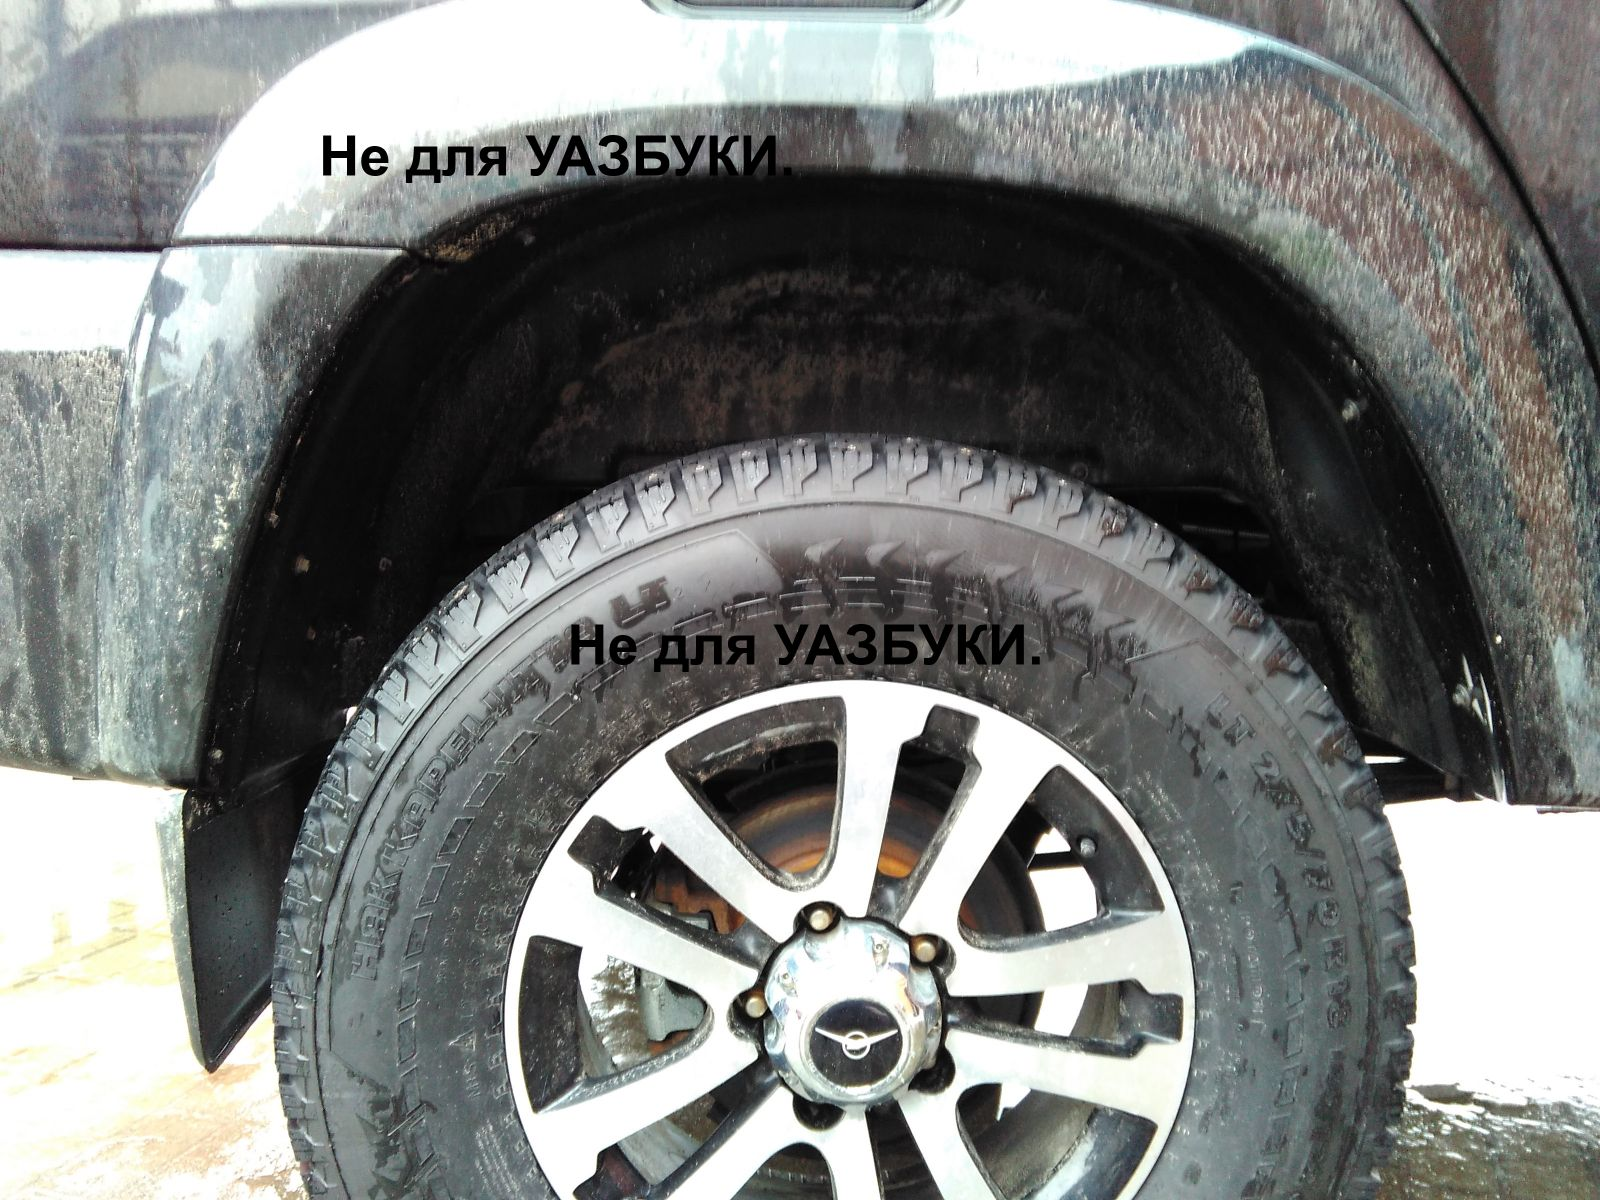 Задняя арка УАЗ Патриот.